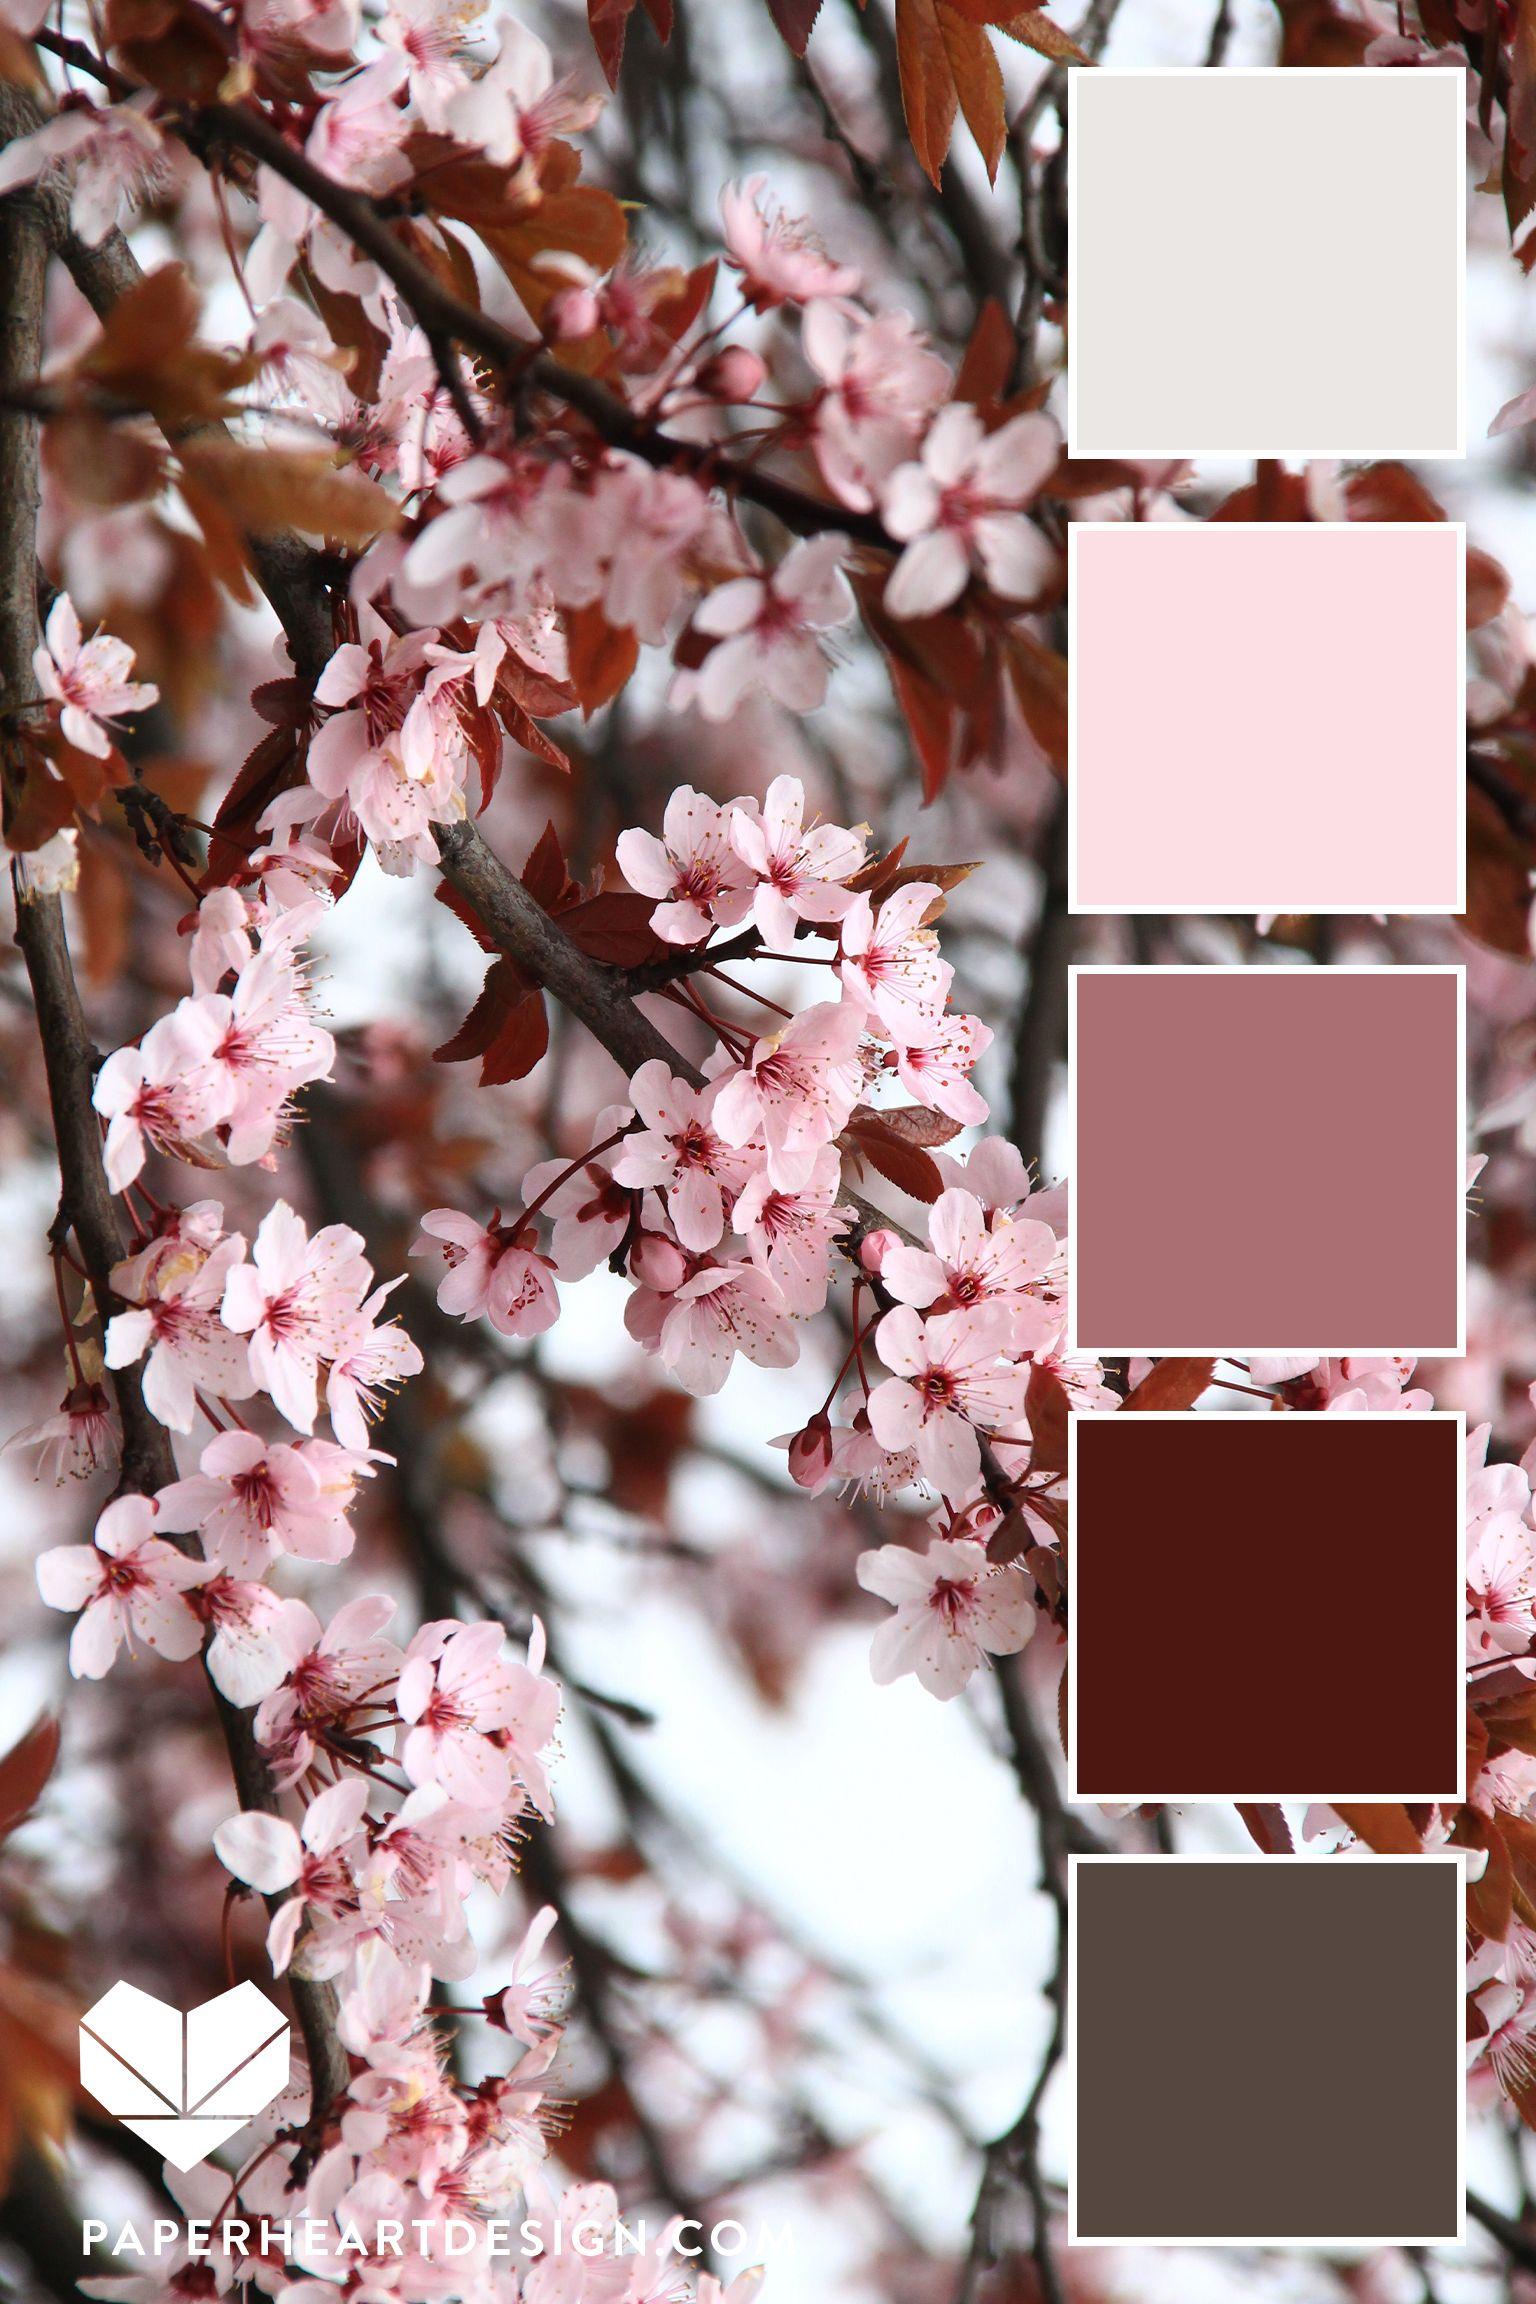 Cherry Blossom Color Palette Flower Inspired Color Scheme Color Schemes Color Schemes Colour Palettes Color Palette Design